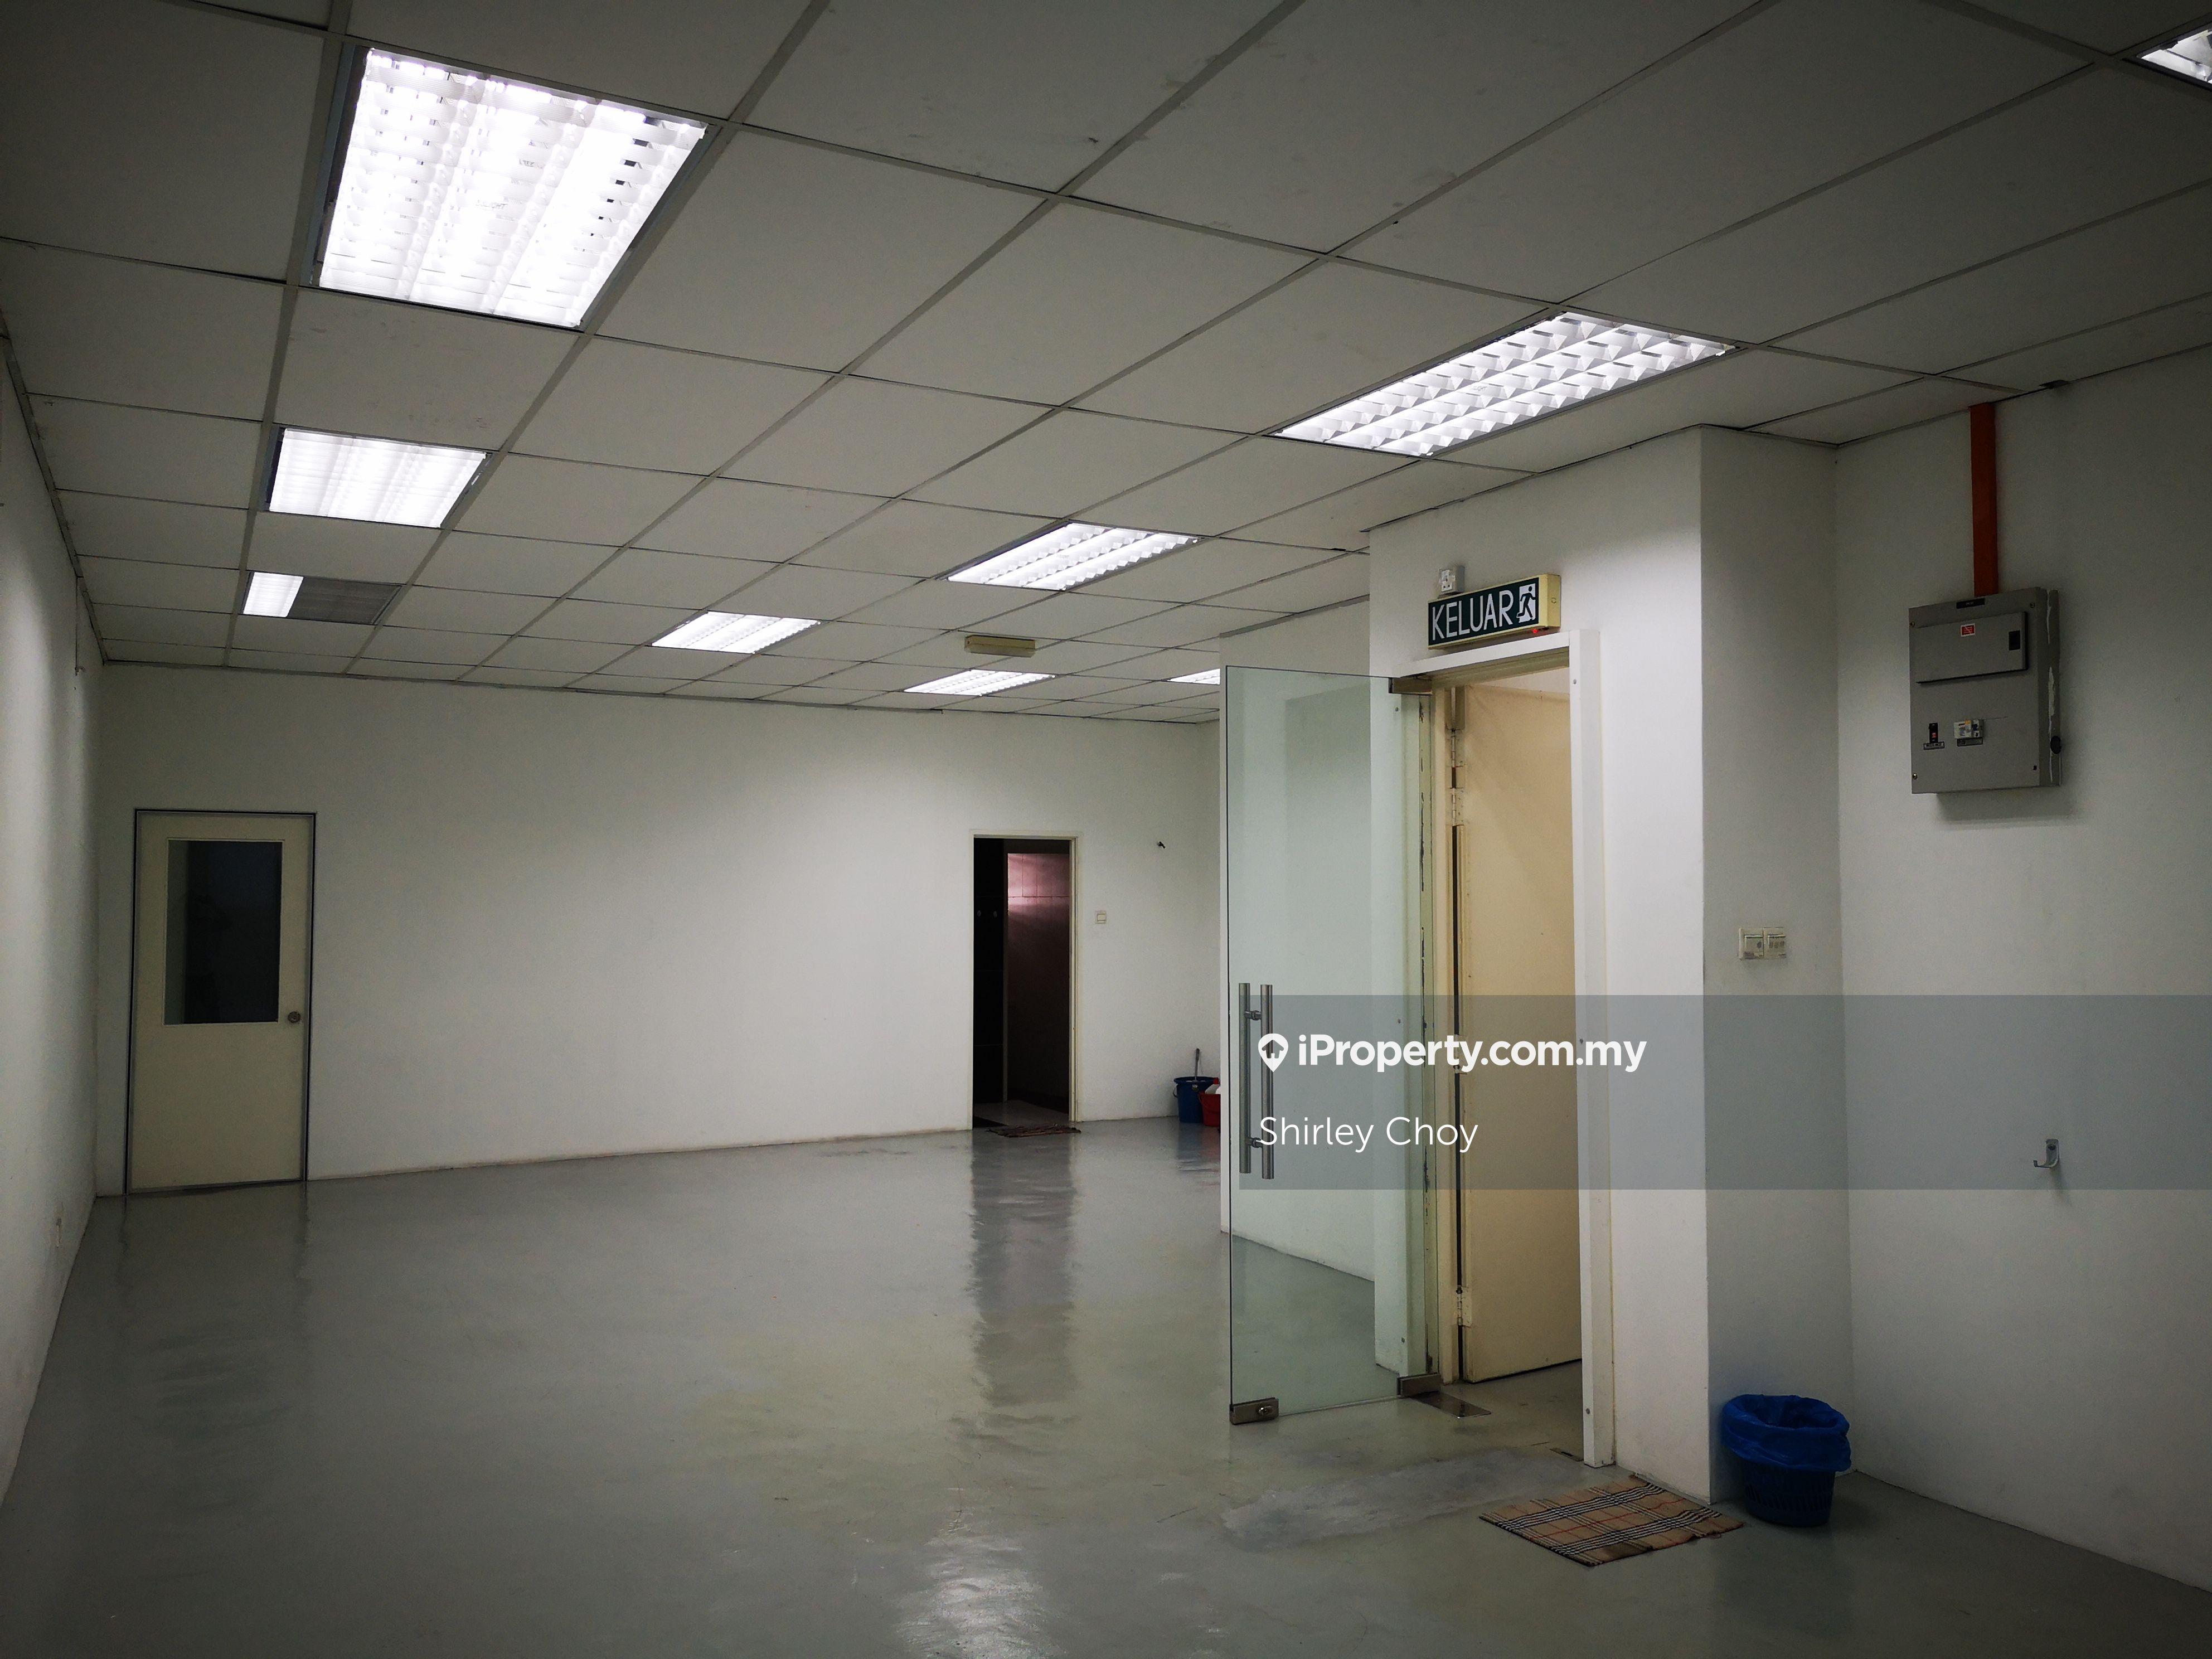 Zest Point Bandar Kinrara_Near LRT Station Alam Sutera Bukit Jalil, Bandar Kinrara, Bukit Jalil